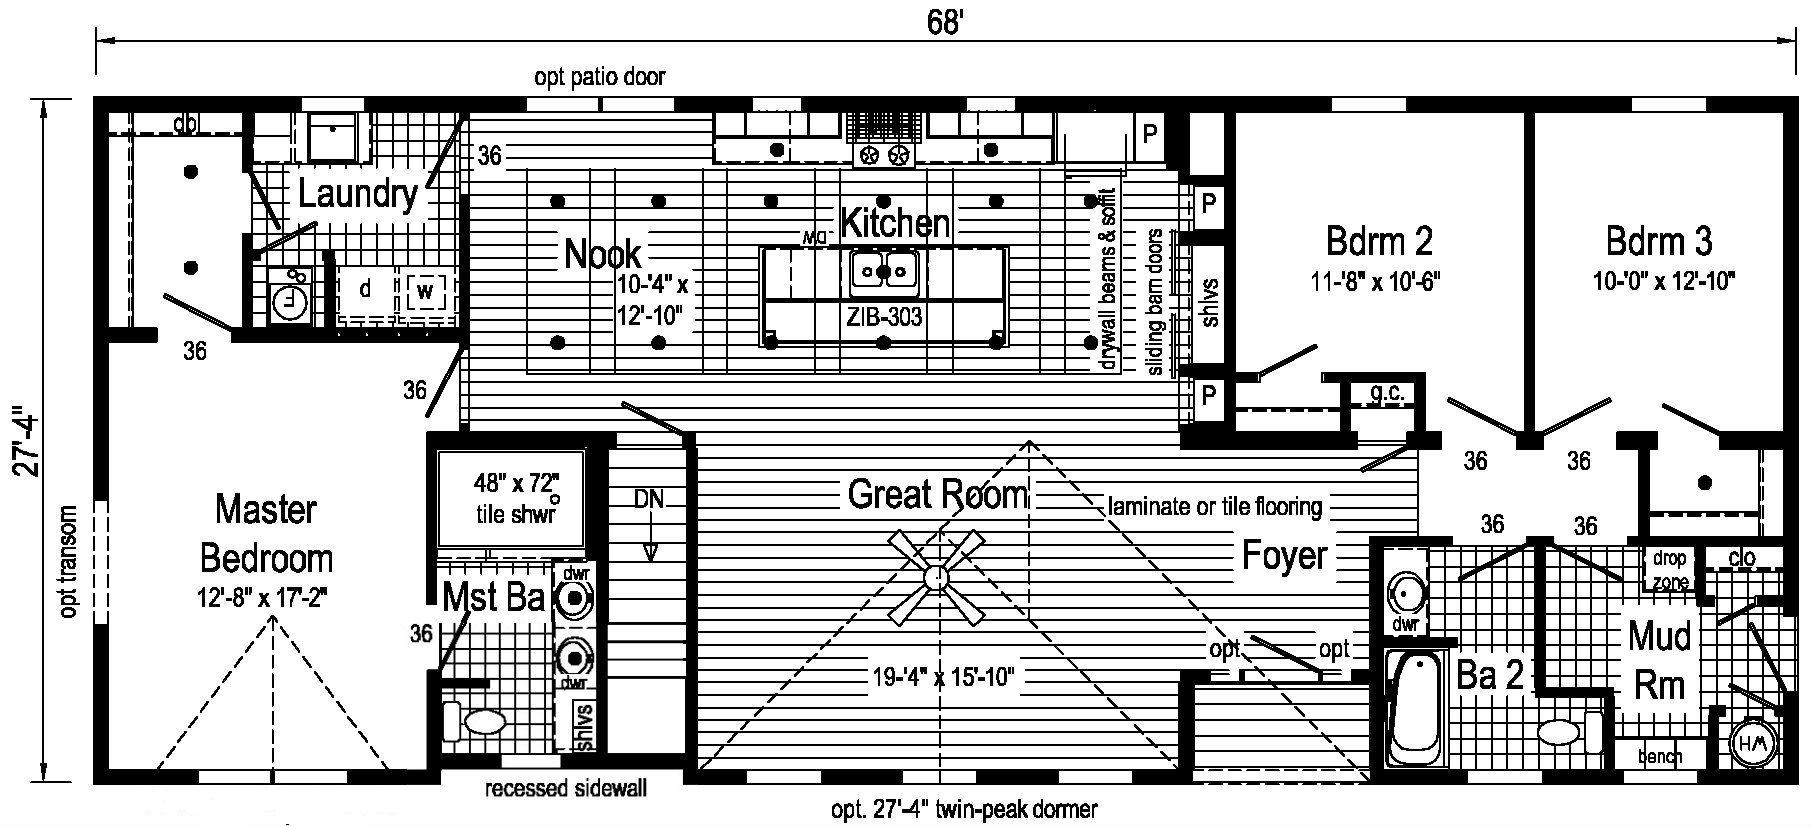 pennwest-le-fantastique-floor-plan.jpg